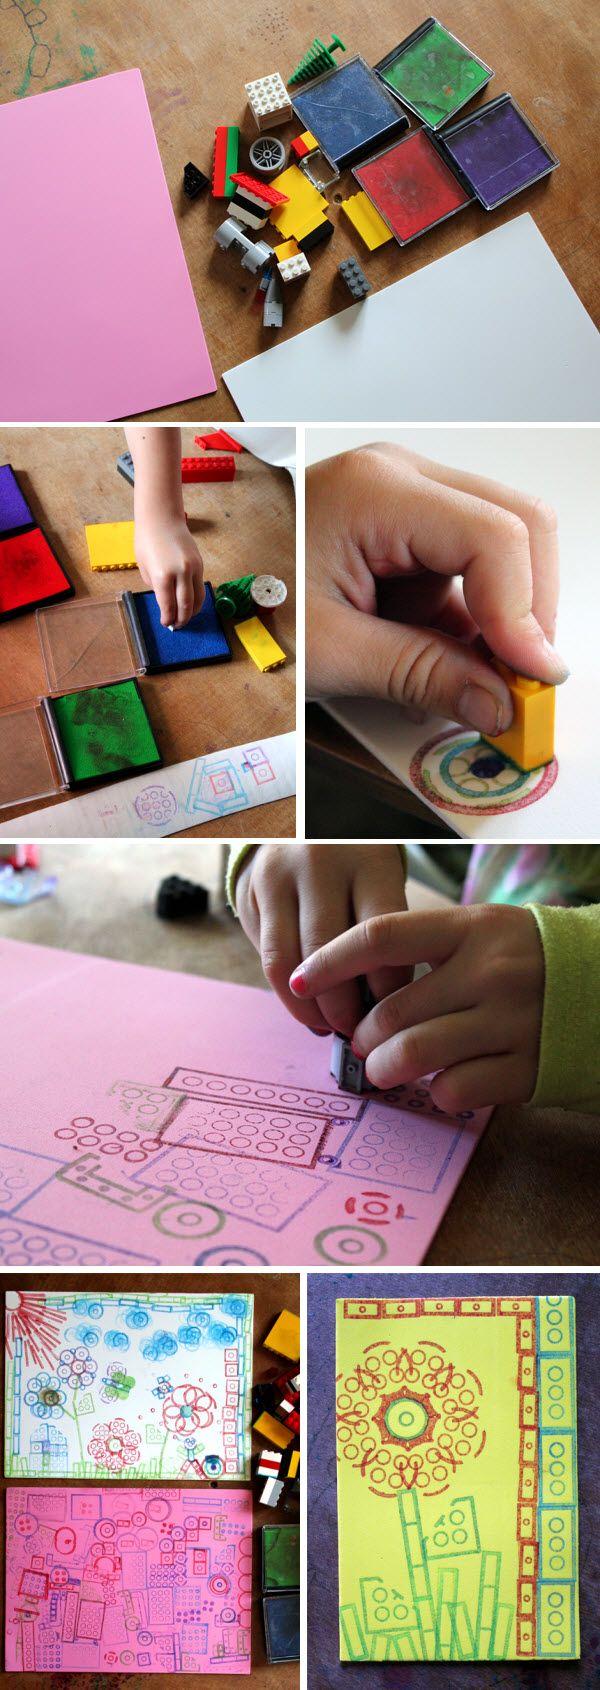 faire un tampon encreur en lego arts pla enfants pinterest lego estampillage et blog. Black Bedroom Furniture Sets. Home Design Ideas